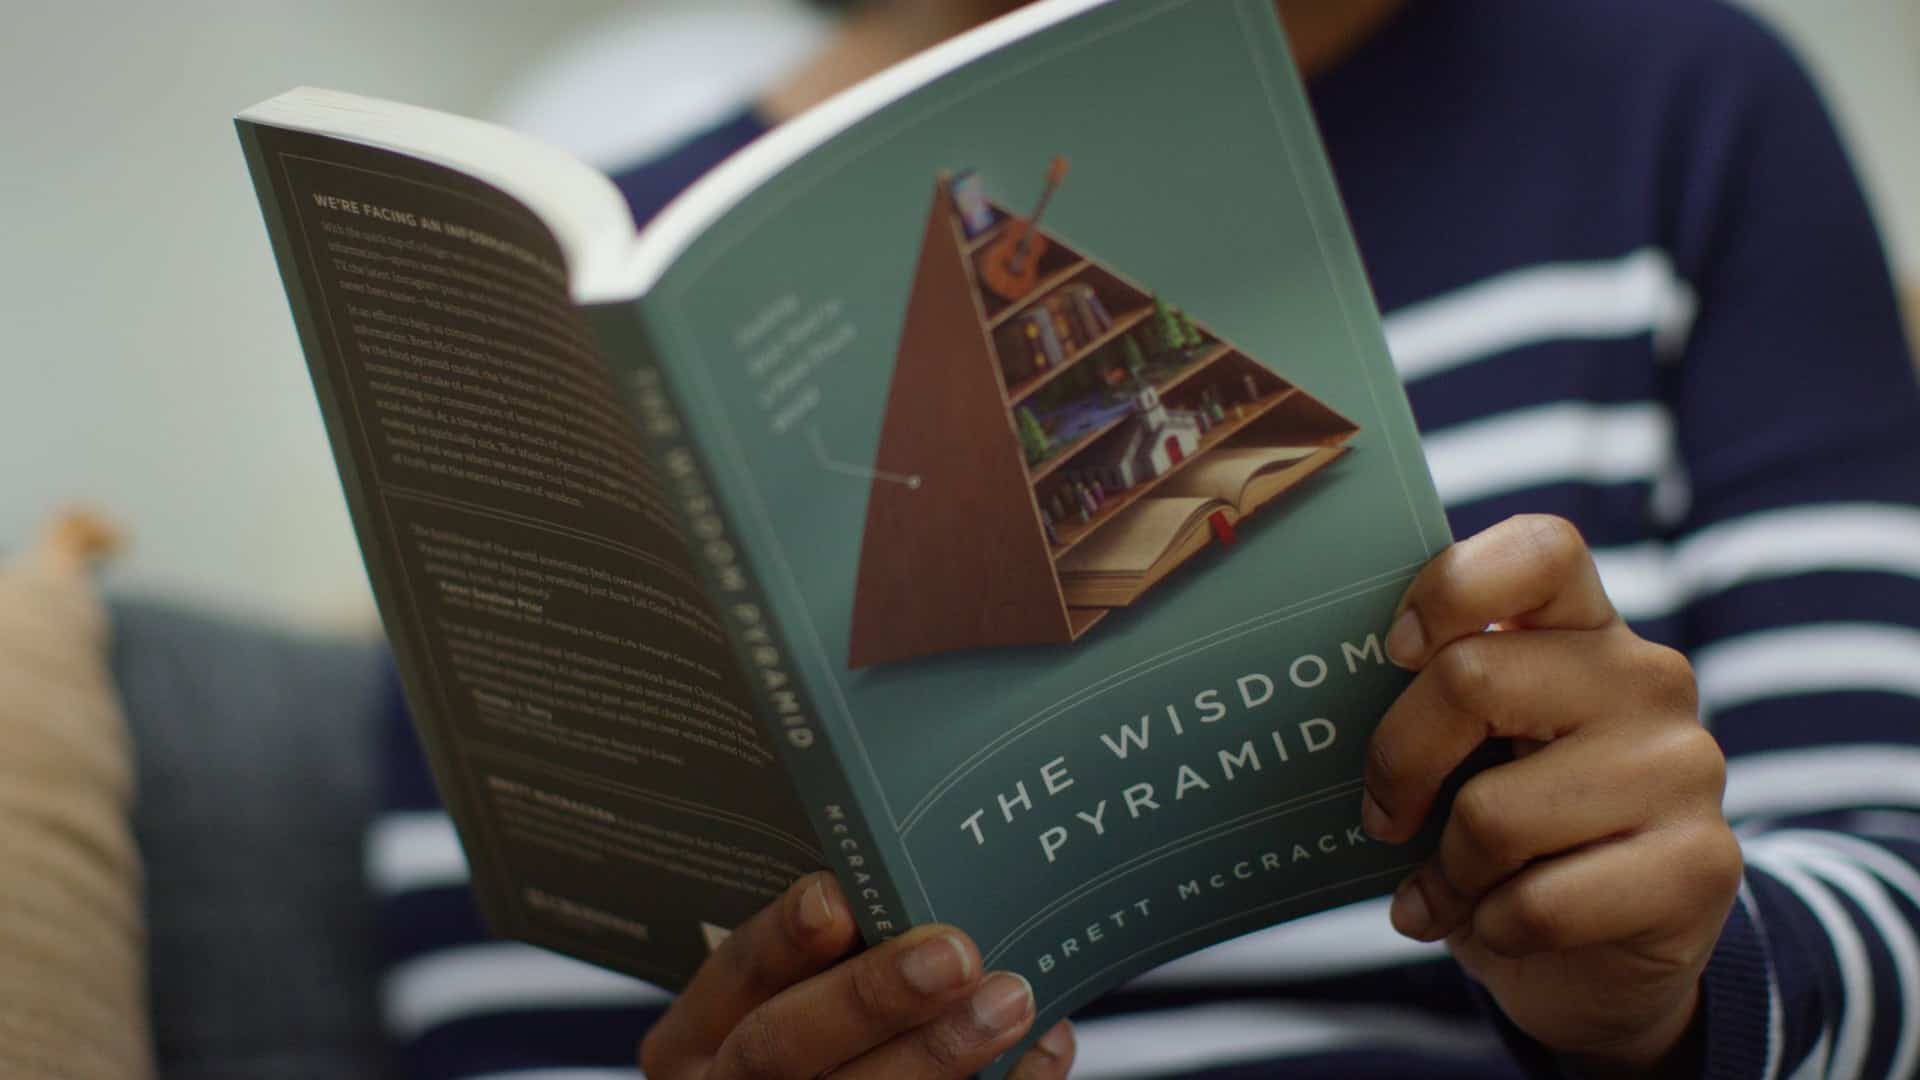 The Wisdom Pyramid with Brett McCracken